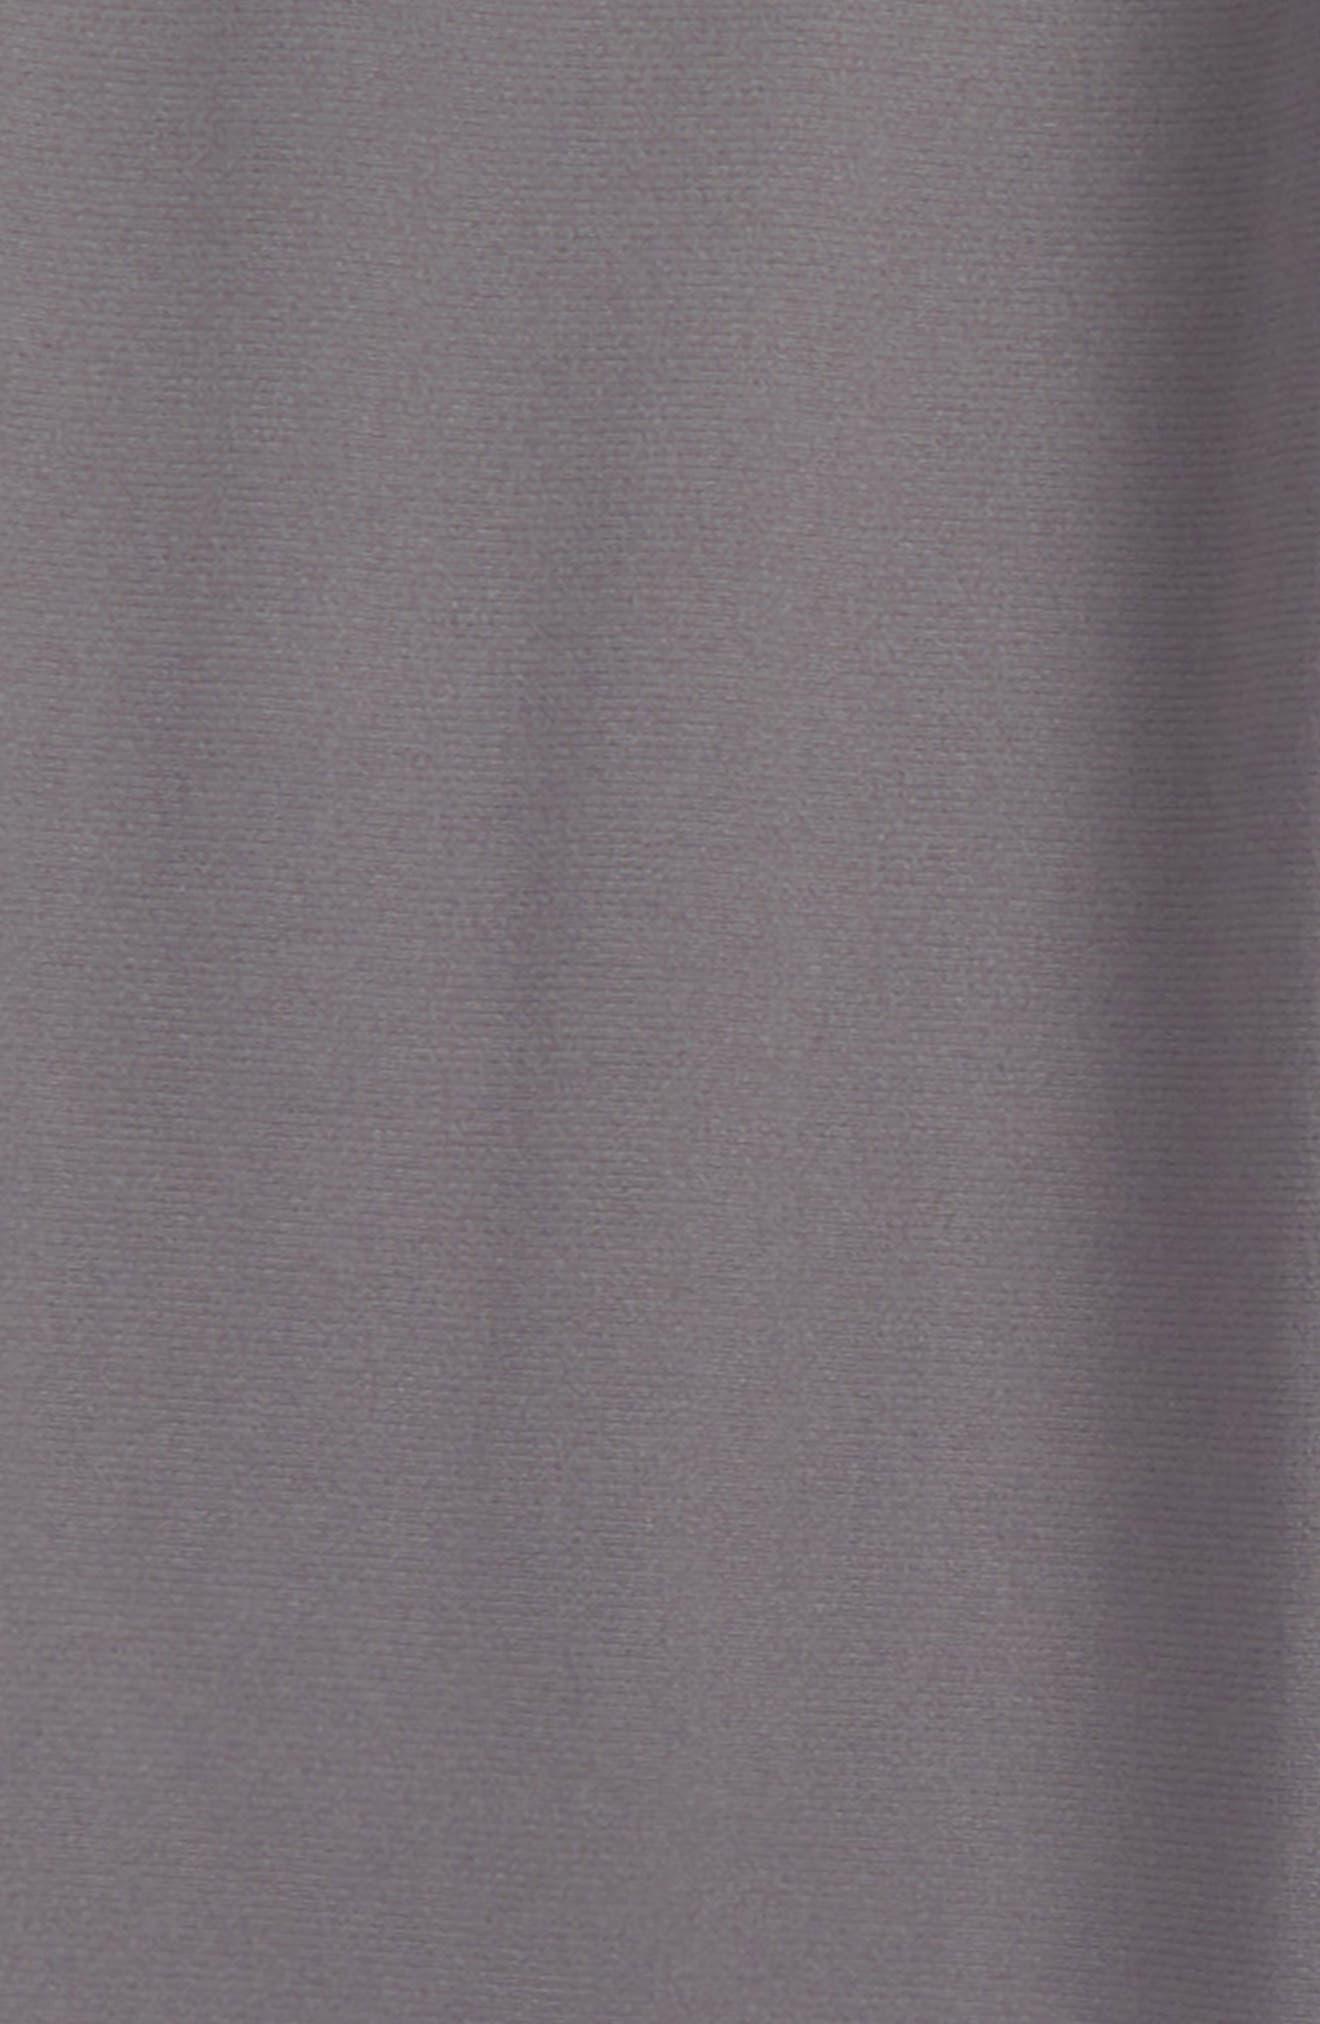 Brawler Tapered Sweatpants,                             Alternate thumbnail 3, color,                             Graphite/ Black